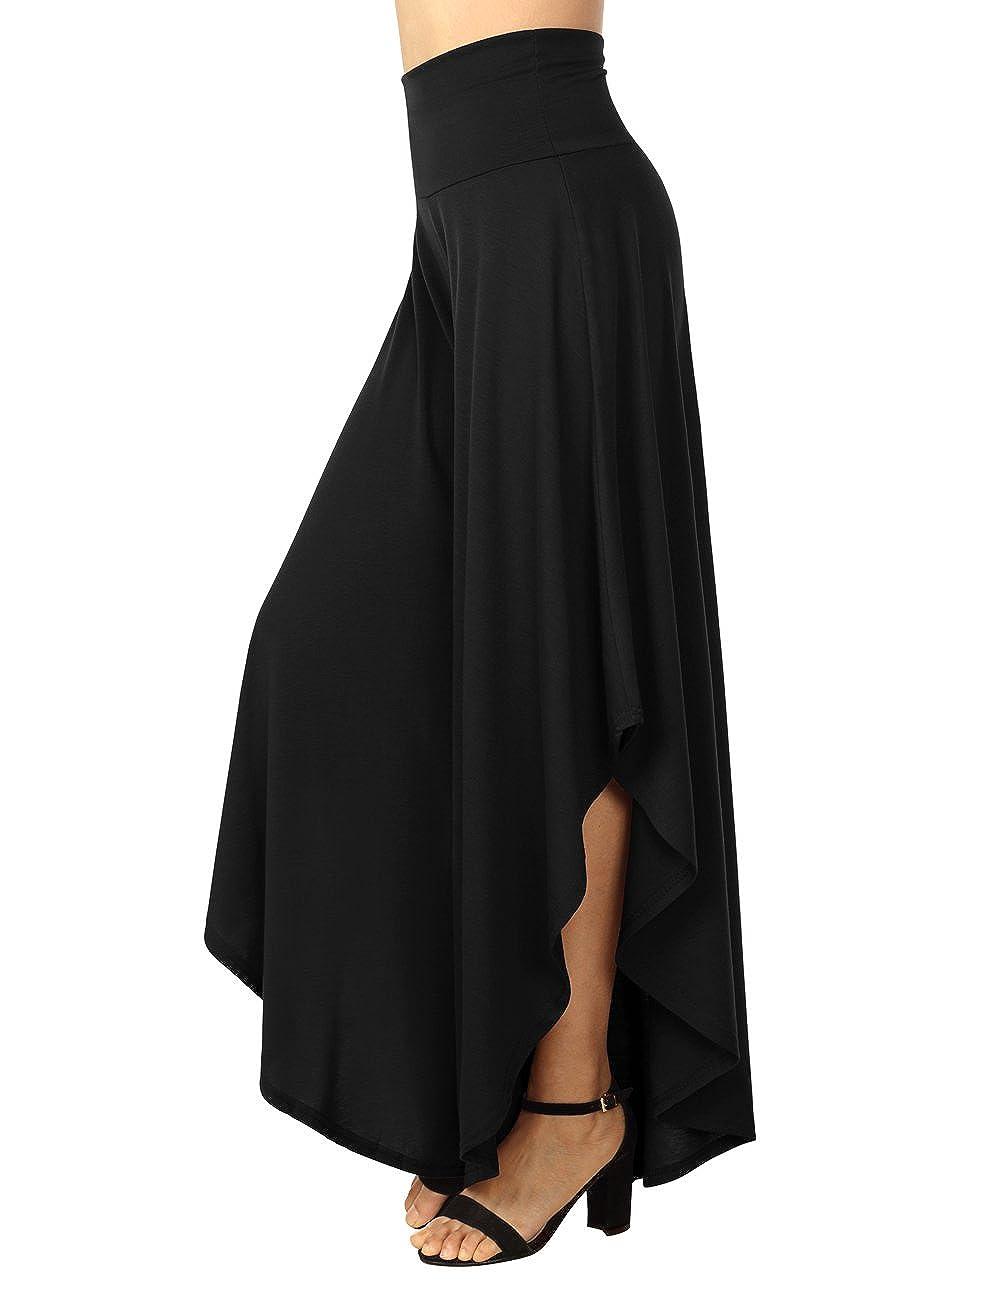 BAISHENGGT Women's Layered Wide Leg Flowy Palazzo Pants 3/4 Length High Waist